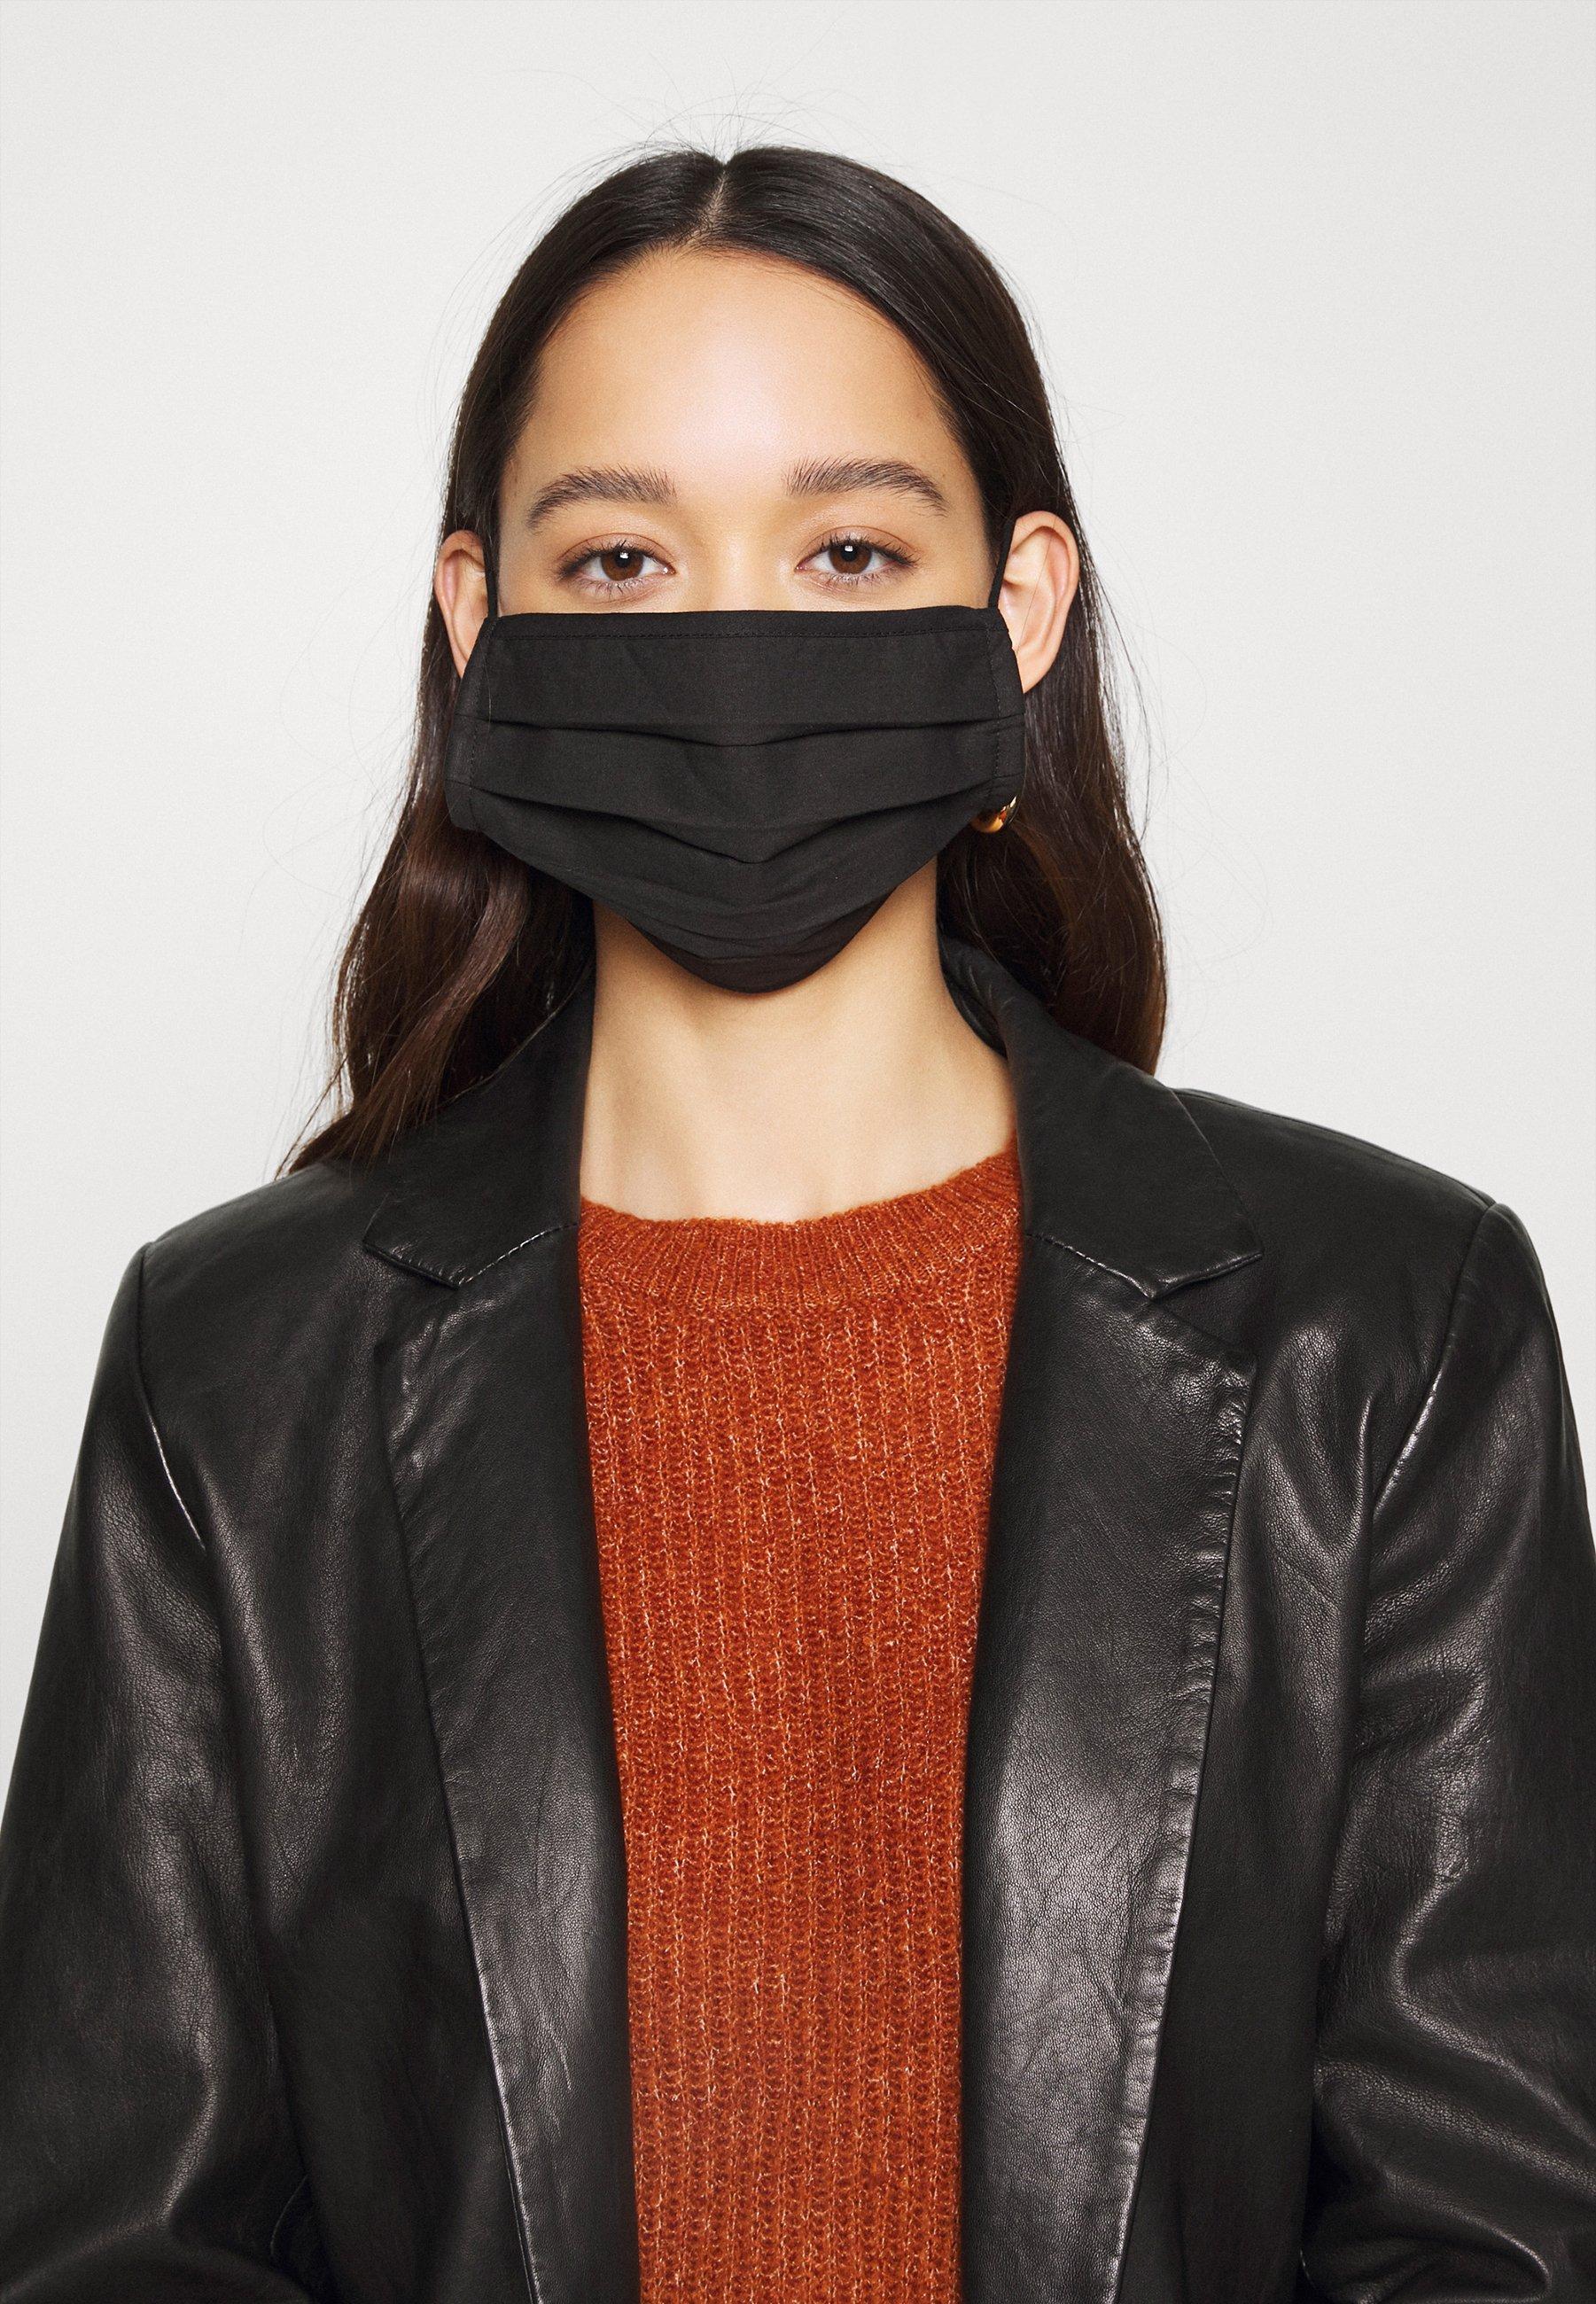 Women PCCOMMUNITY MASK ADULT 2 PACK - Community mask